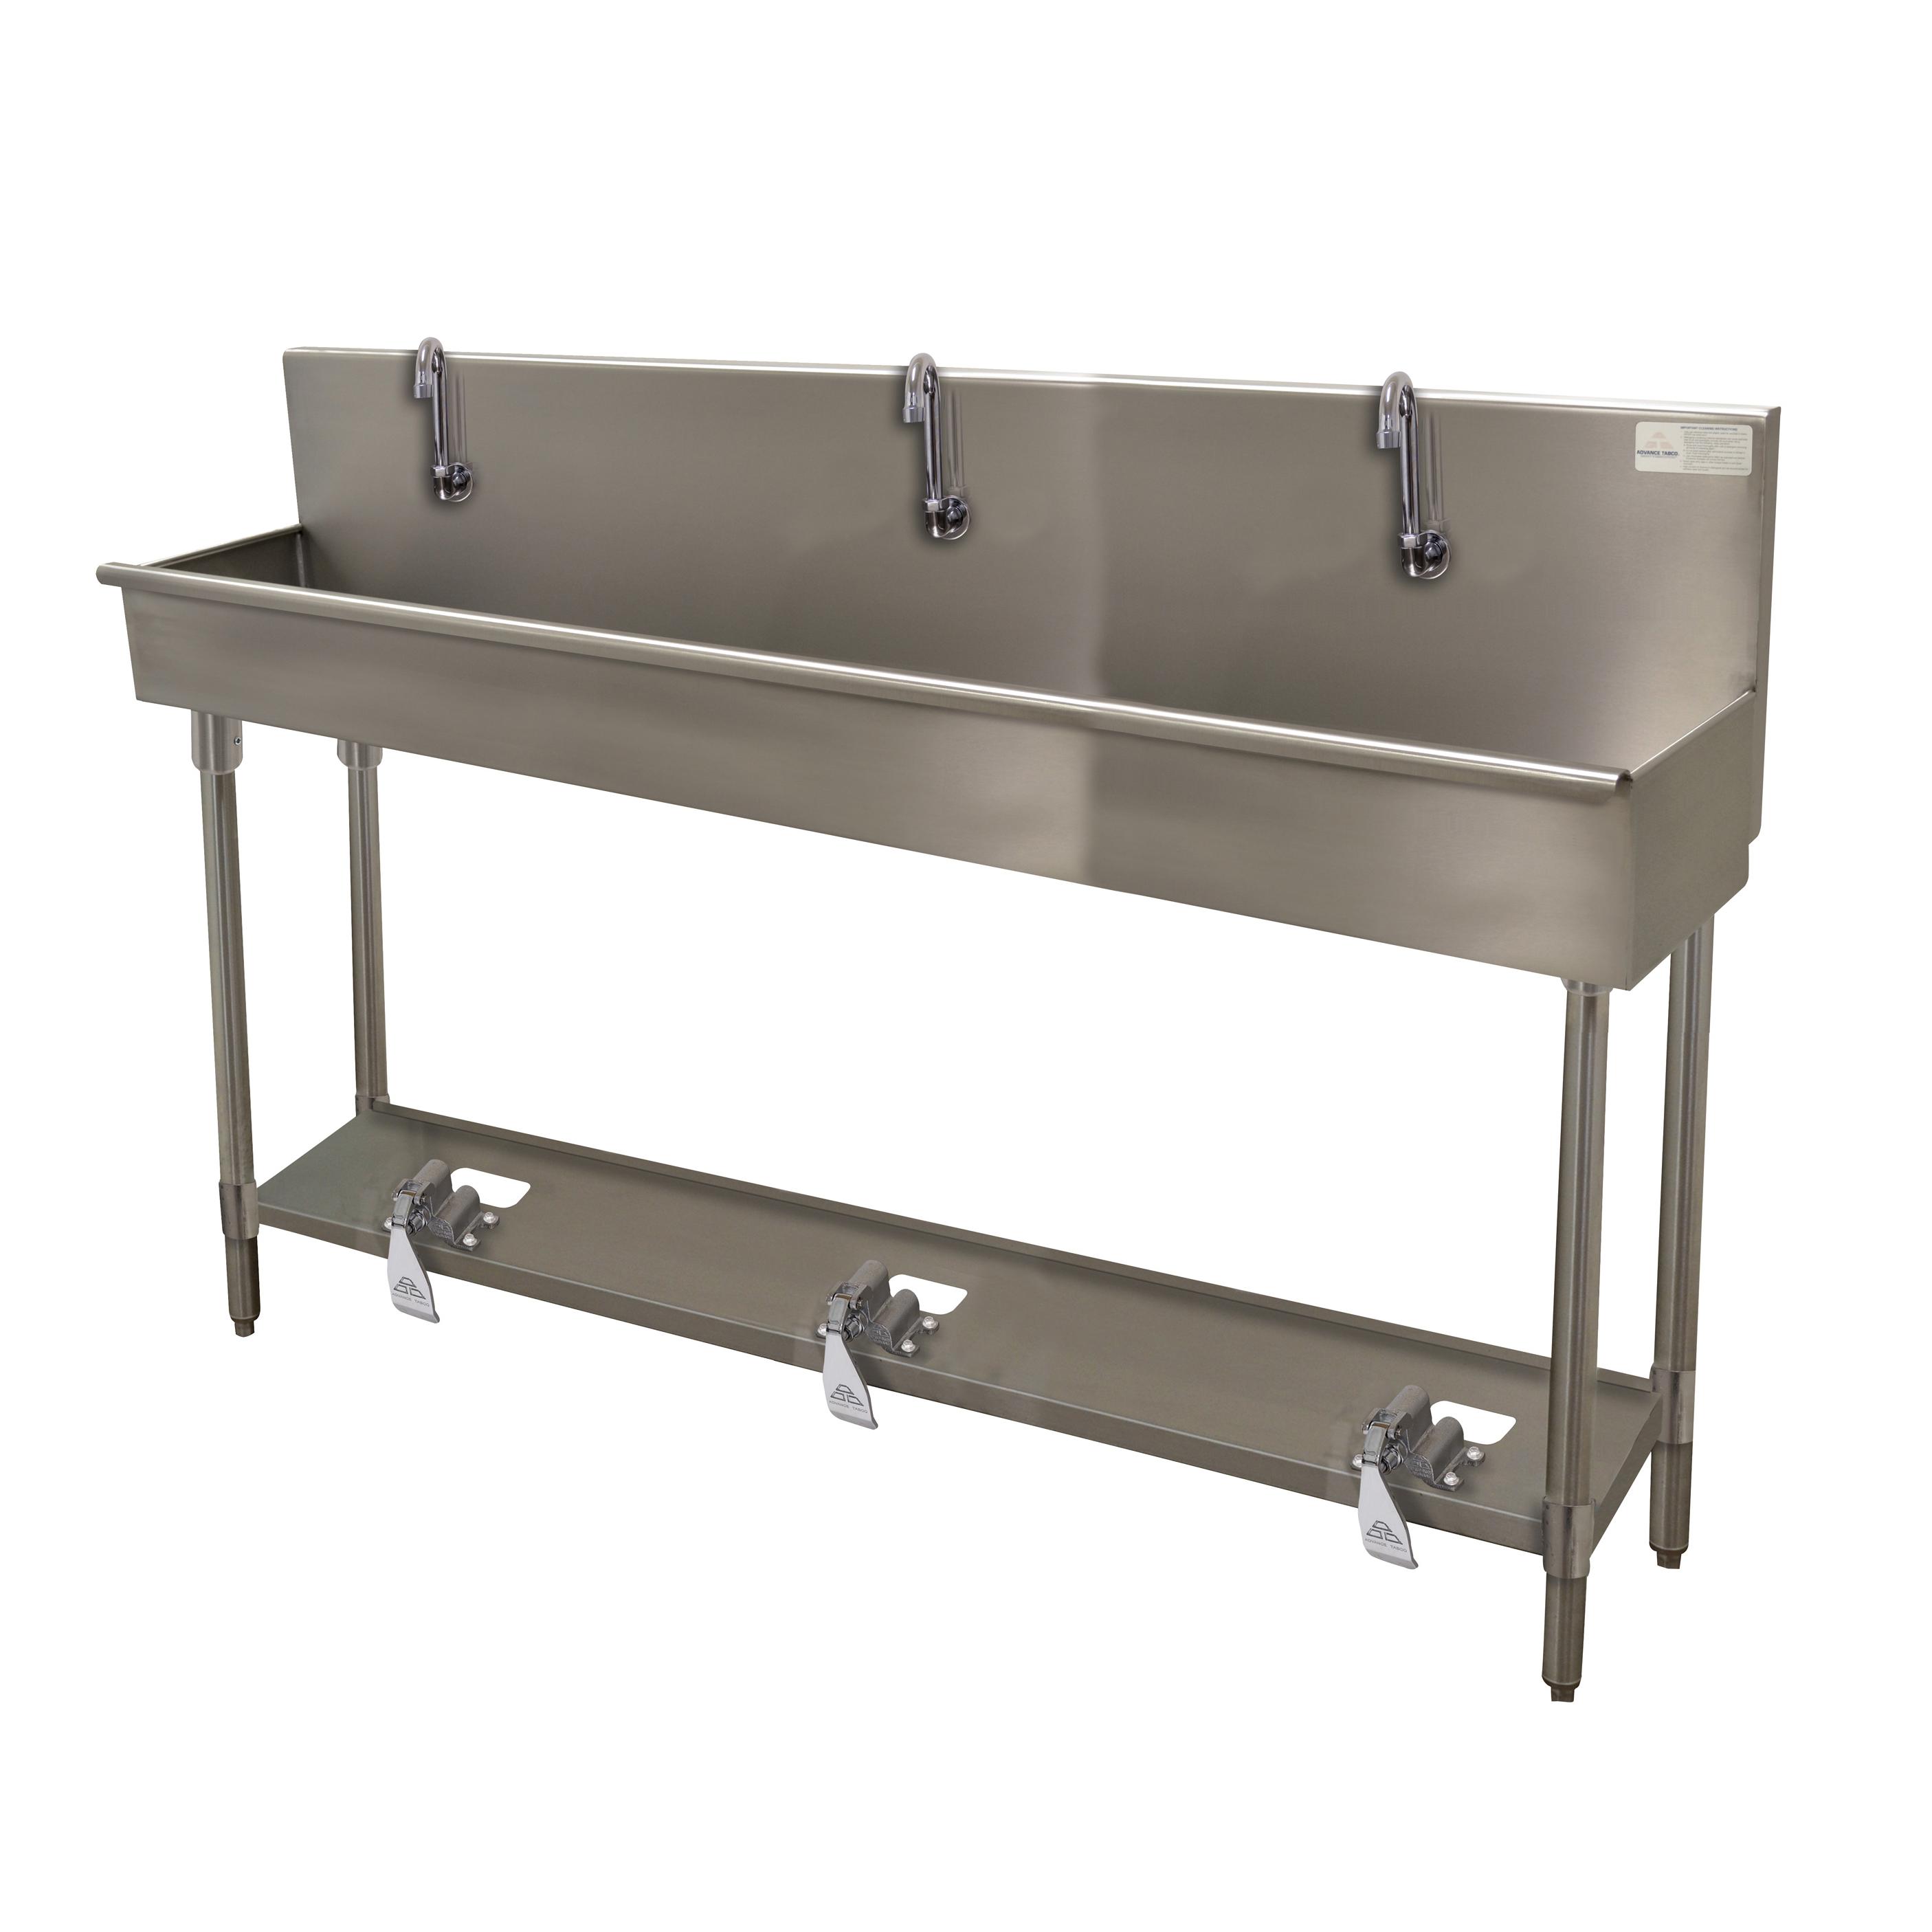 Advance Tabco 19-FM-60FV sink, hand